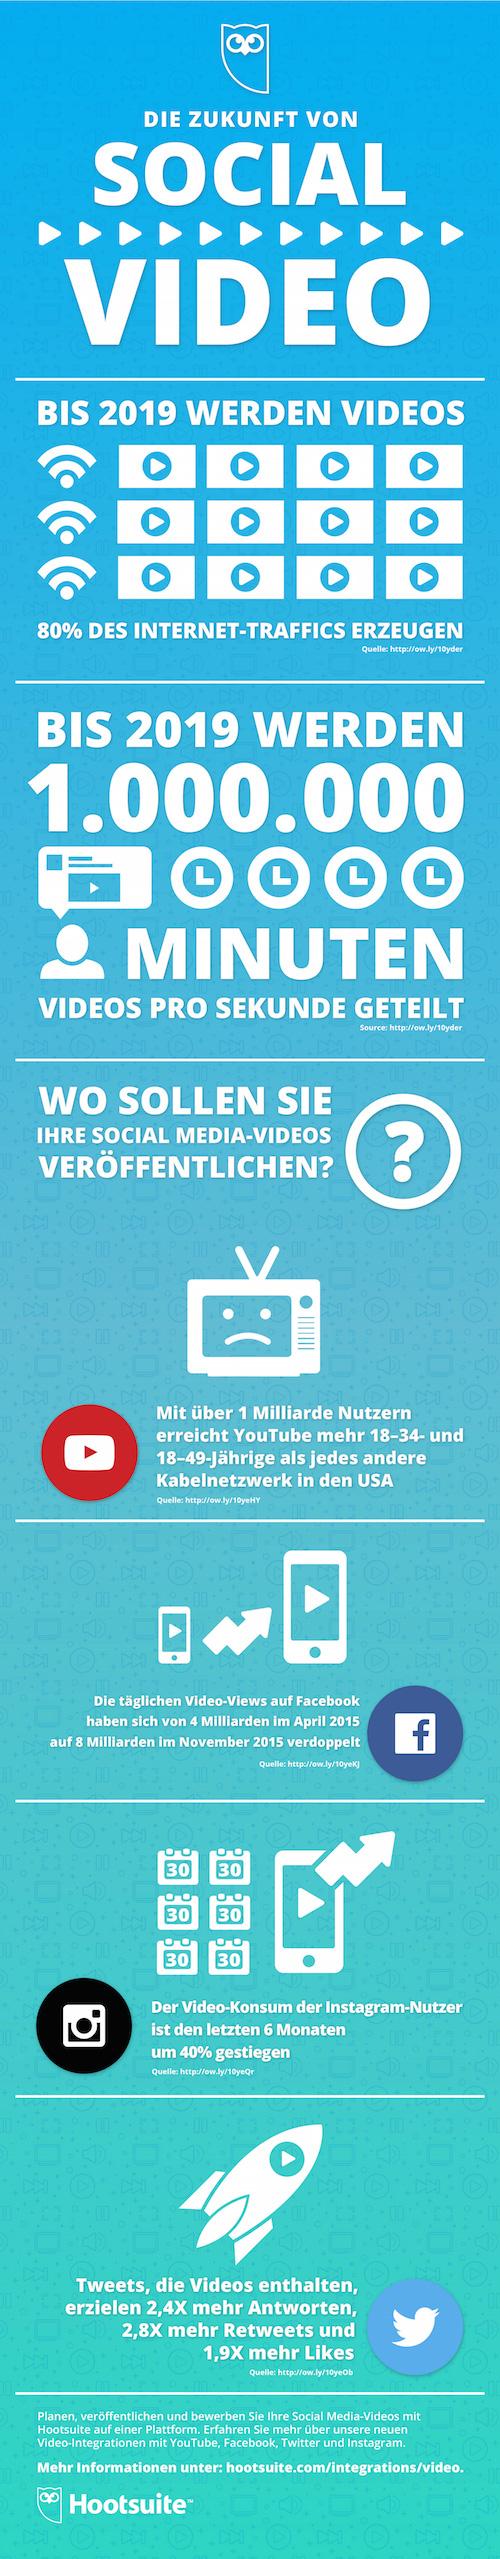 video infographic